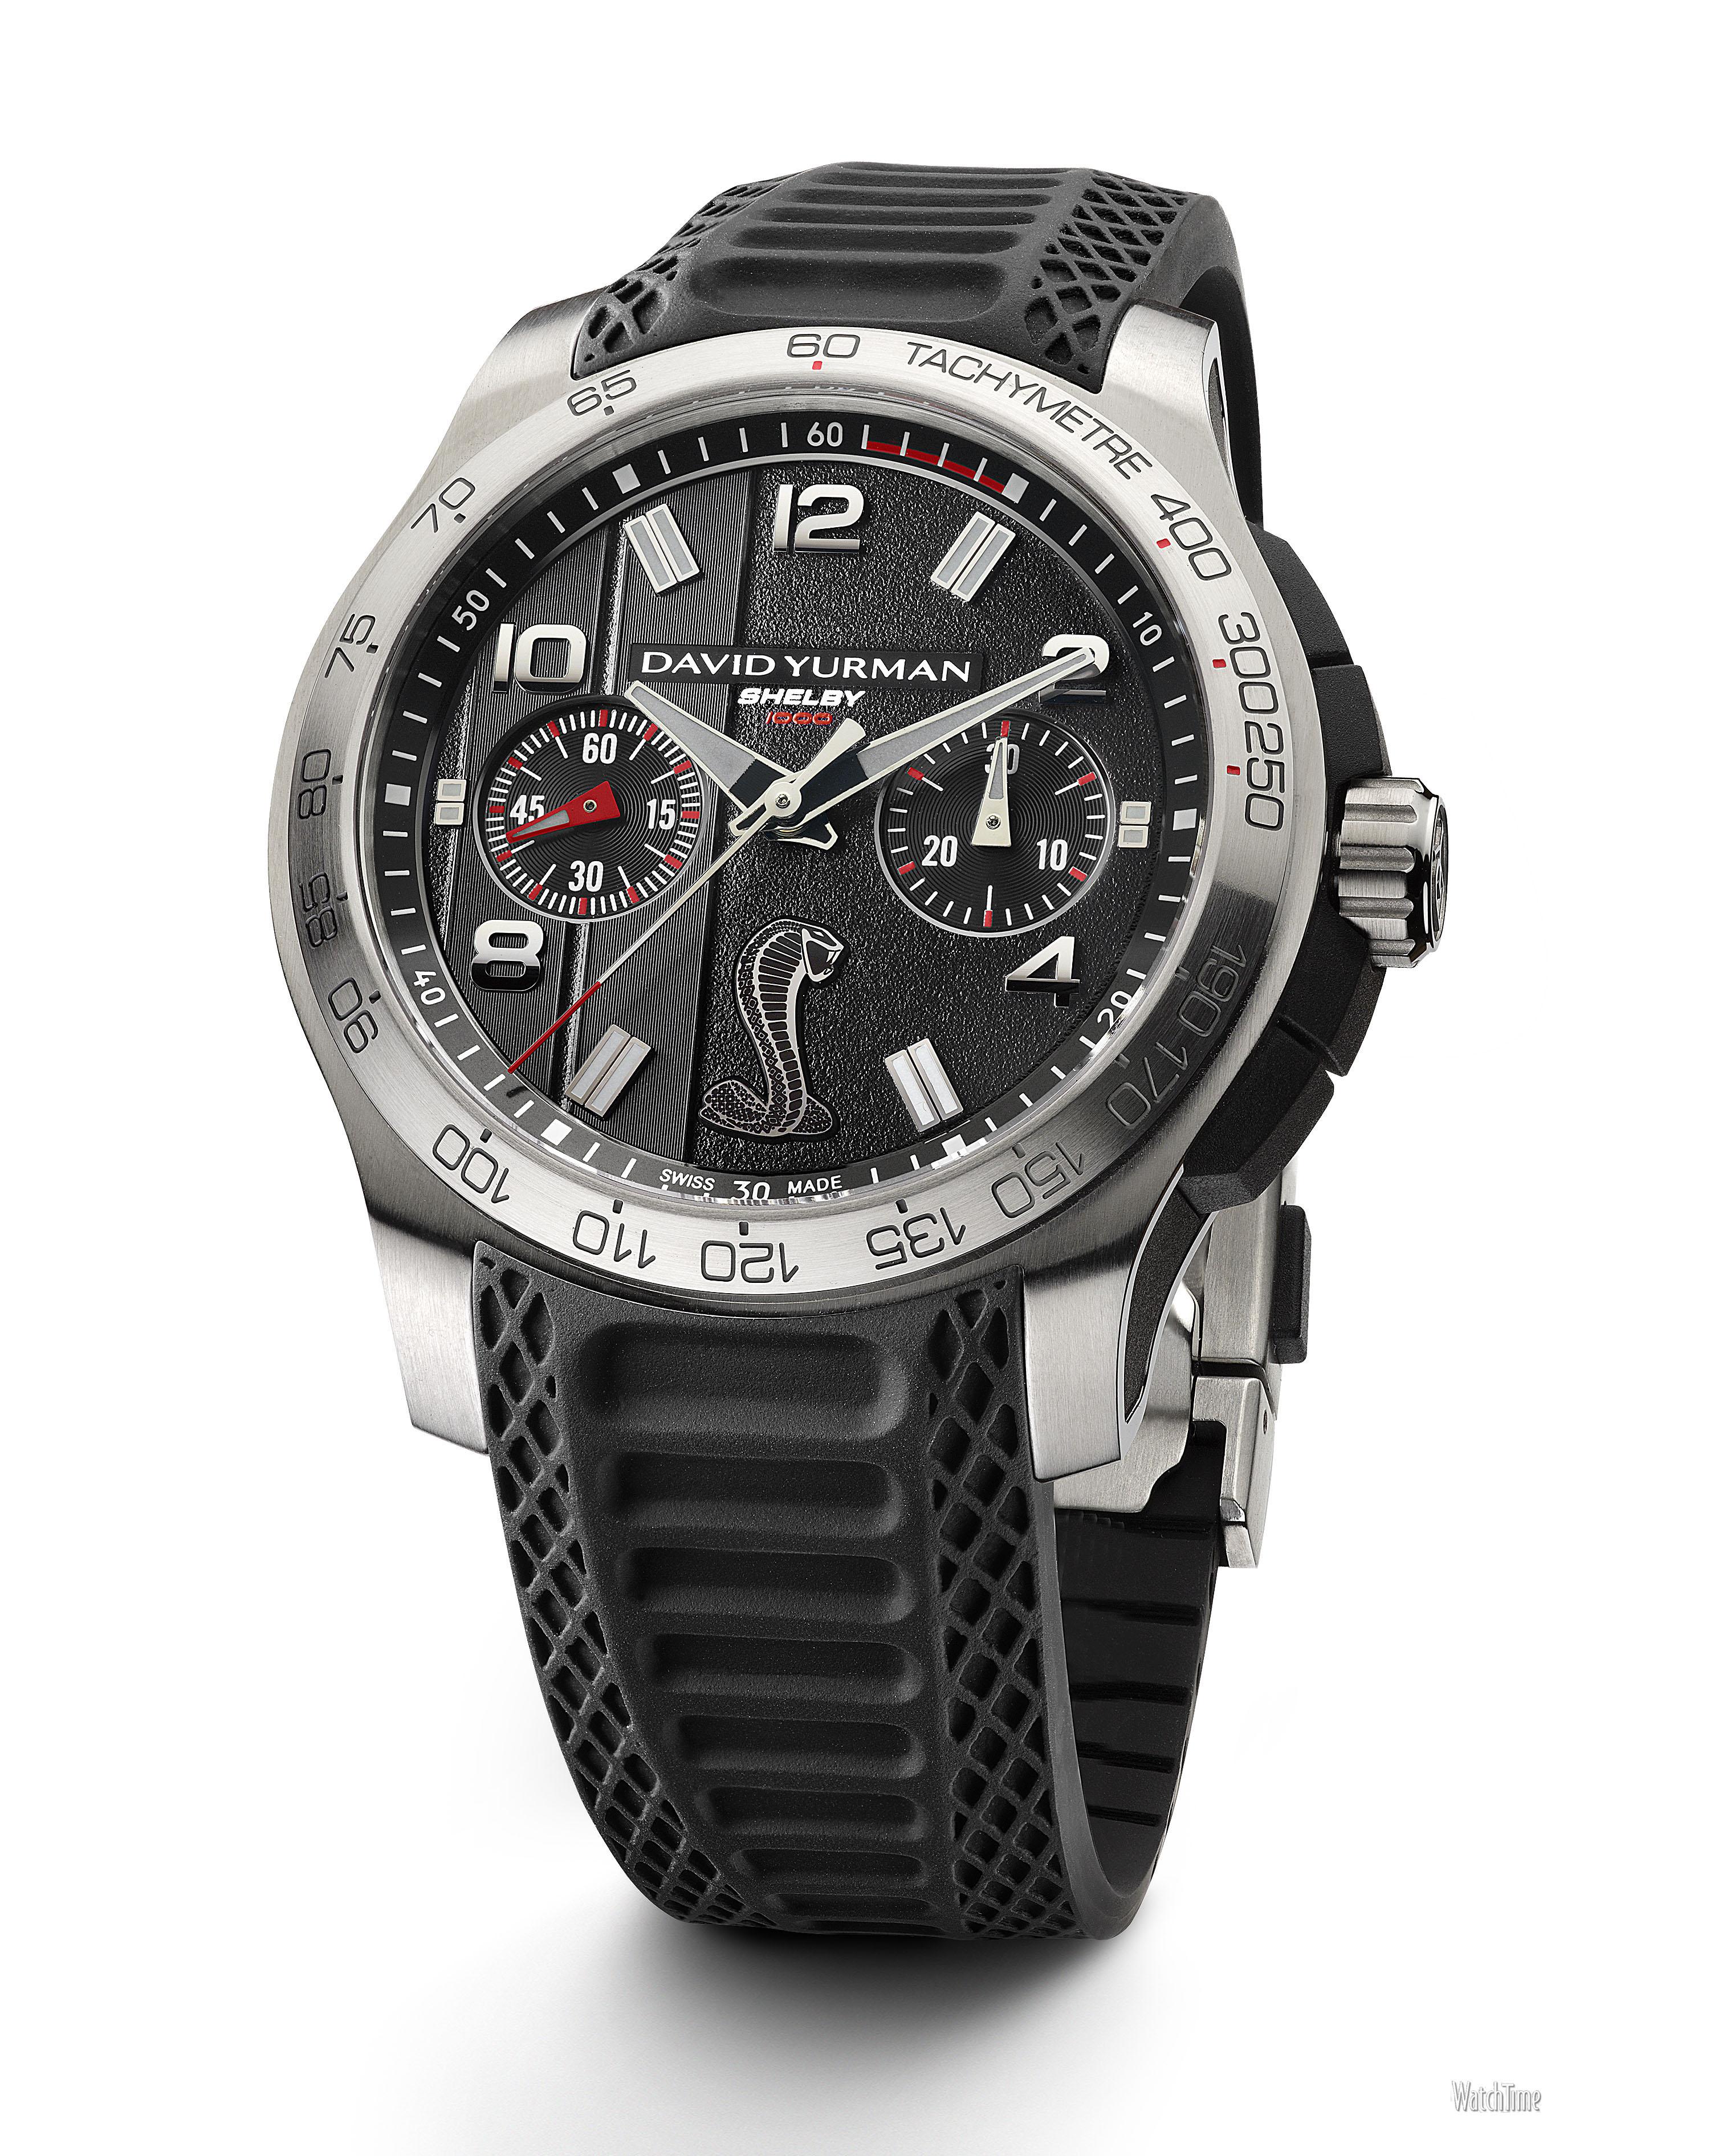 "cable meets cobra david yurman s new shelby 1000 sports watch david yurman revolution shelby 1000 black david yurman revolution shelby 1000 silver """